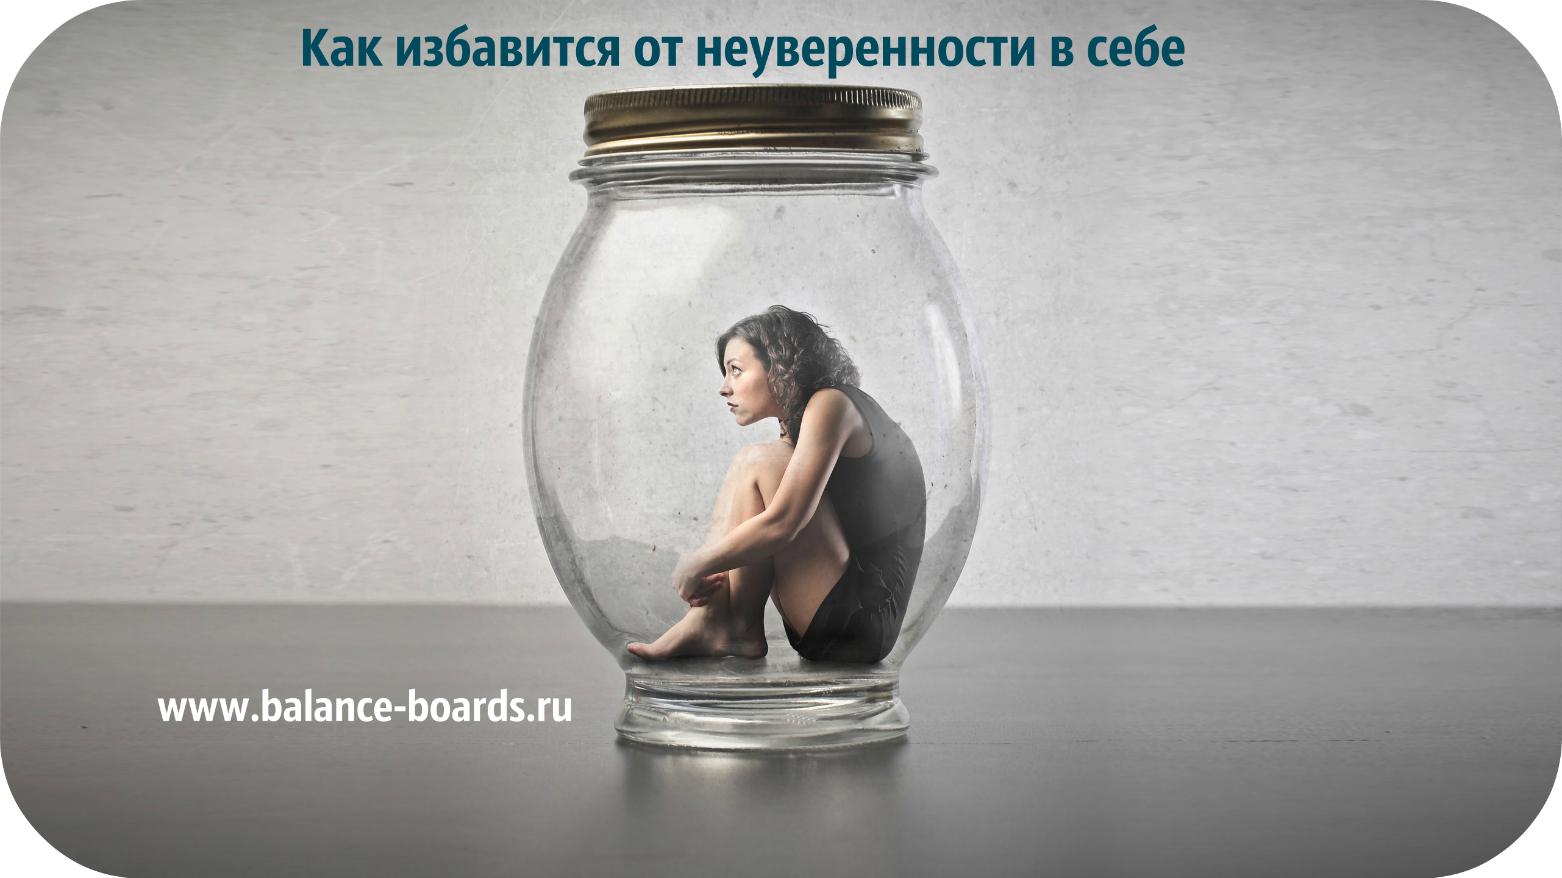 http://balance-boards.ru/images/upload/Как%20избавится%20от%20неуверенности%20в%20себе.jpg